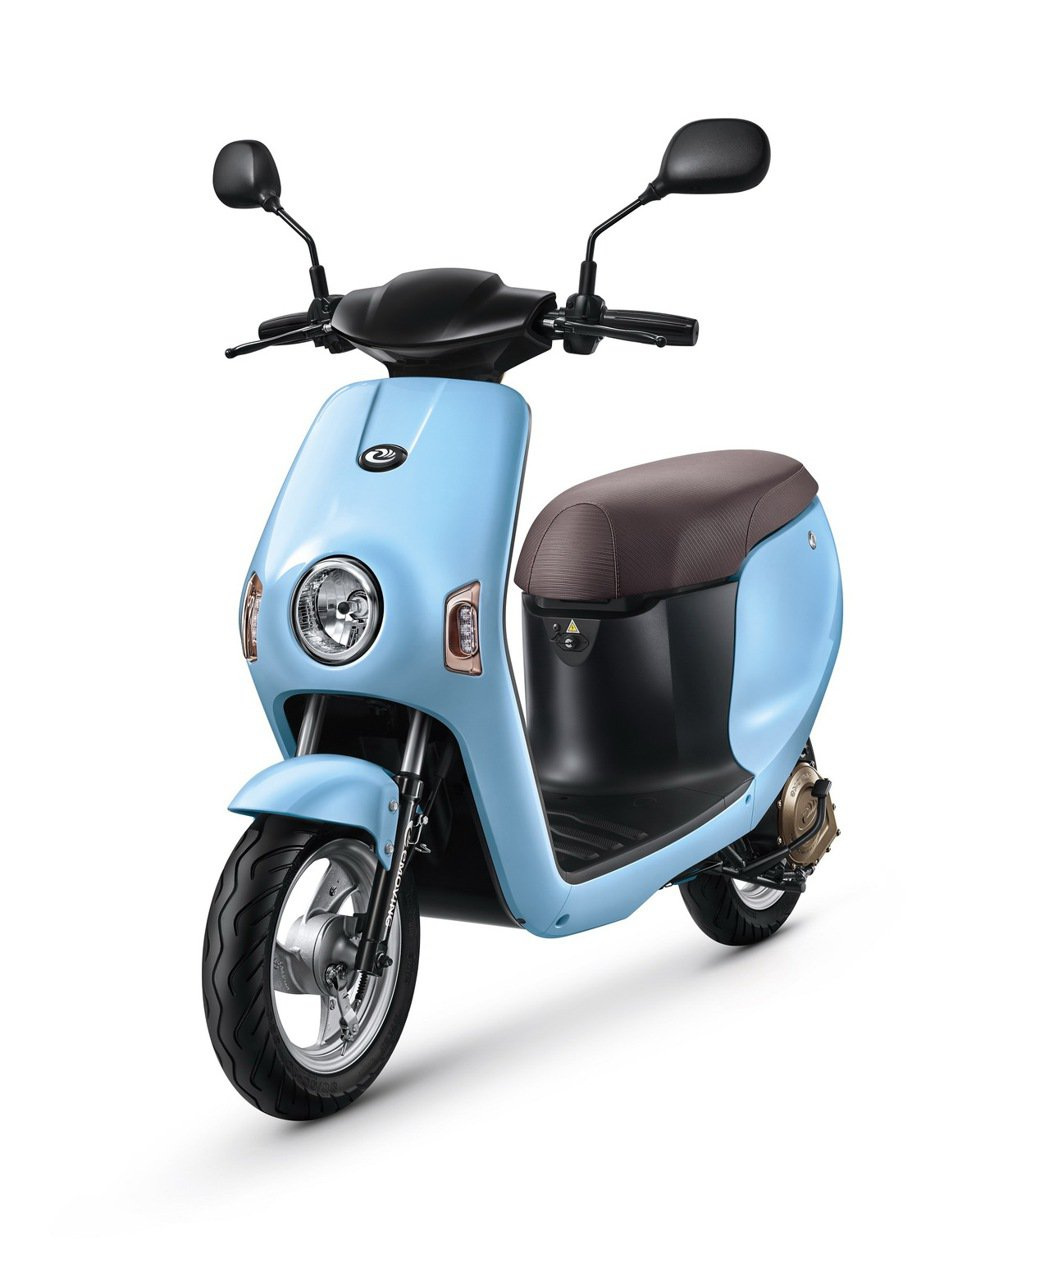 eMOVING Shine「天使藍」顏色,增添活潑氣息迎合年輕媽媽們喜好。 圖/...